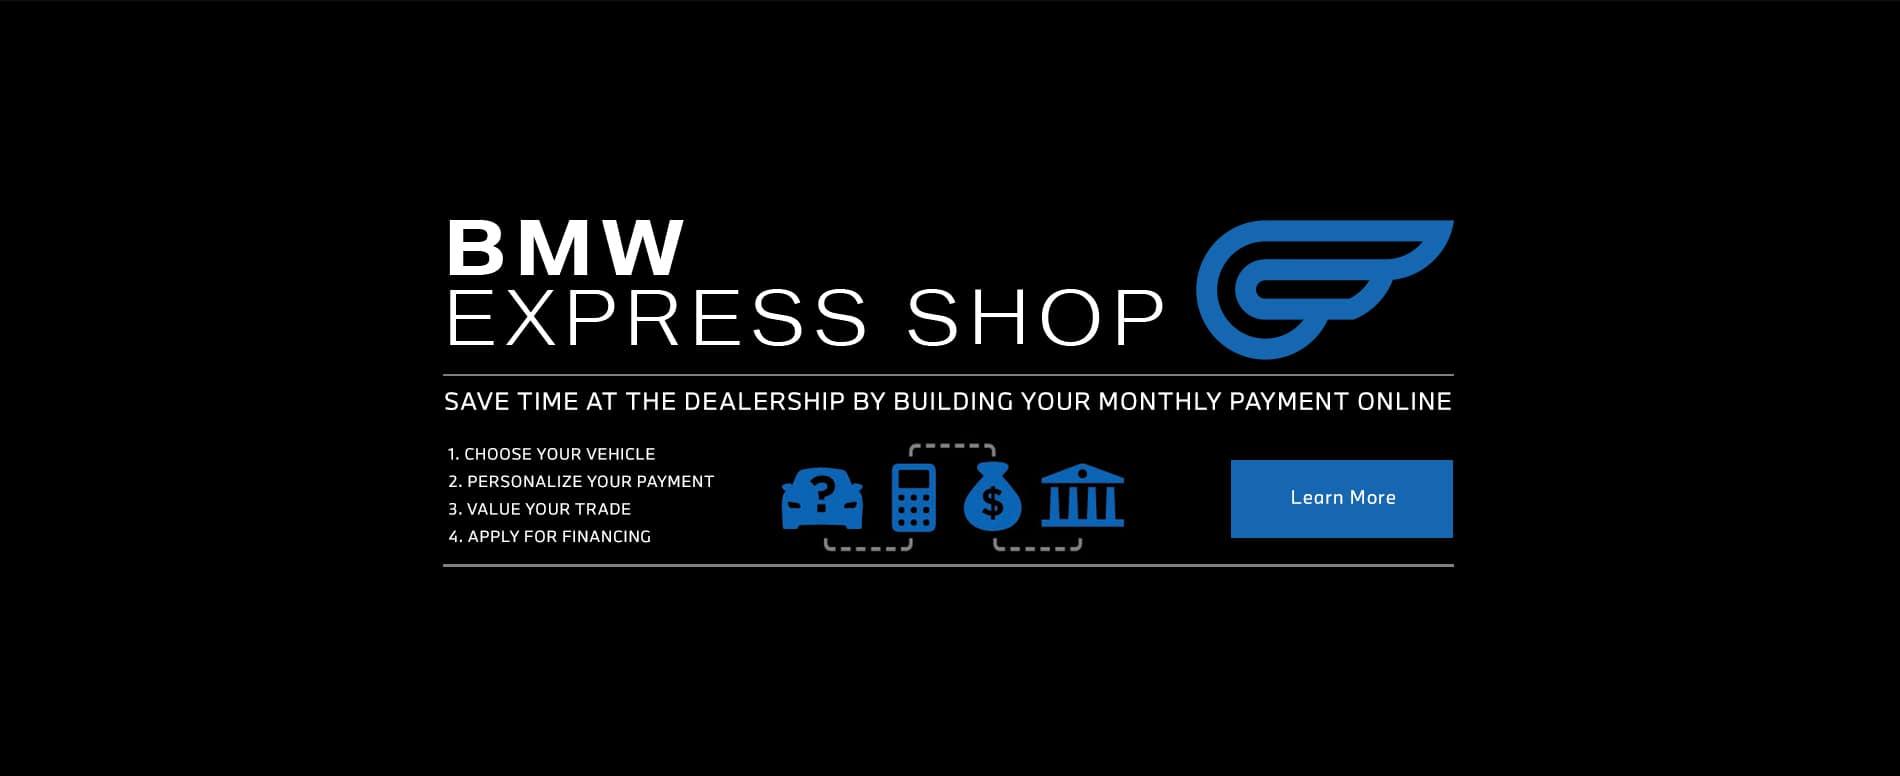 Stay inside and buy online with BMW Minnetonka!